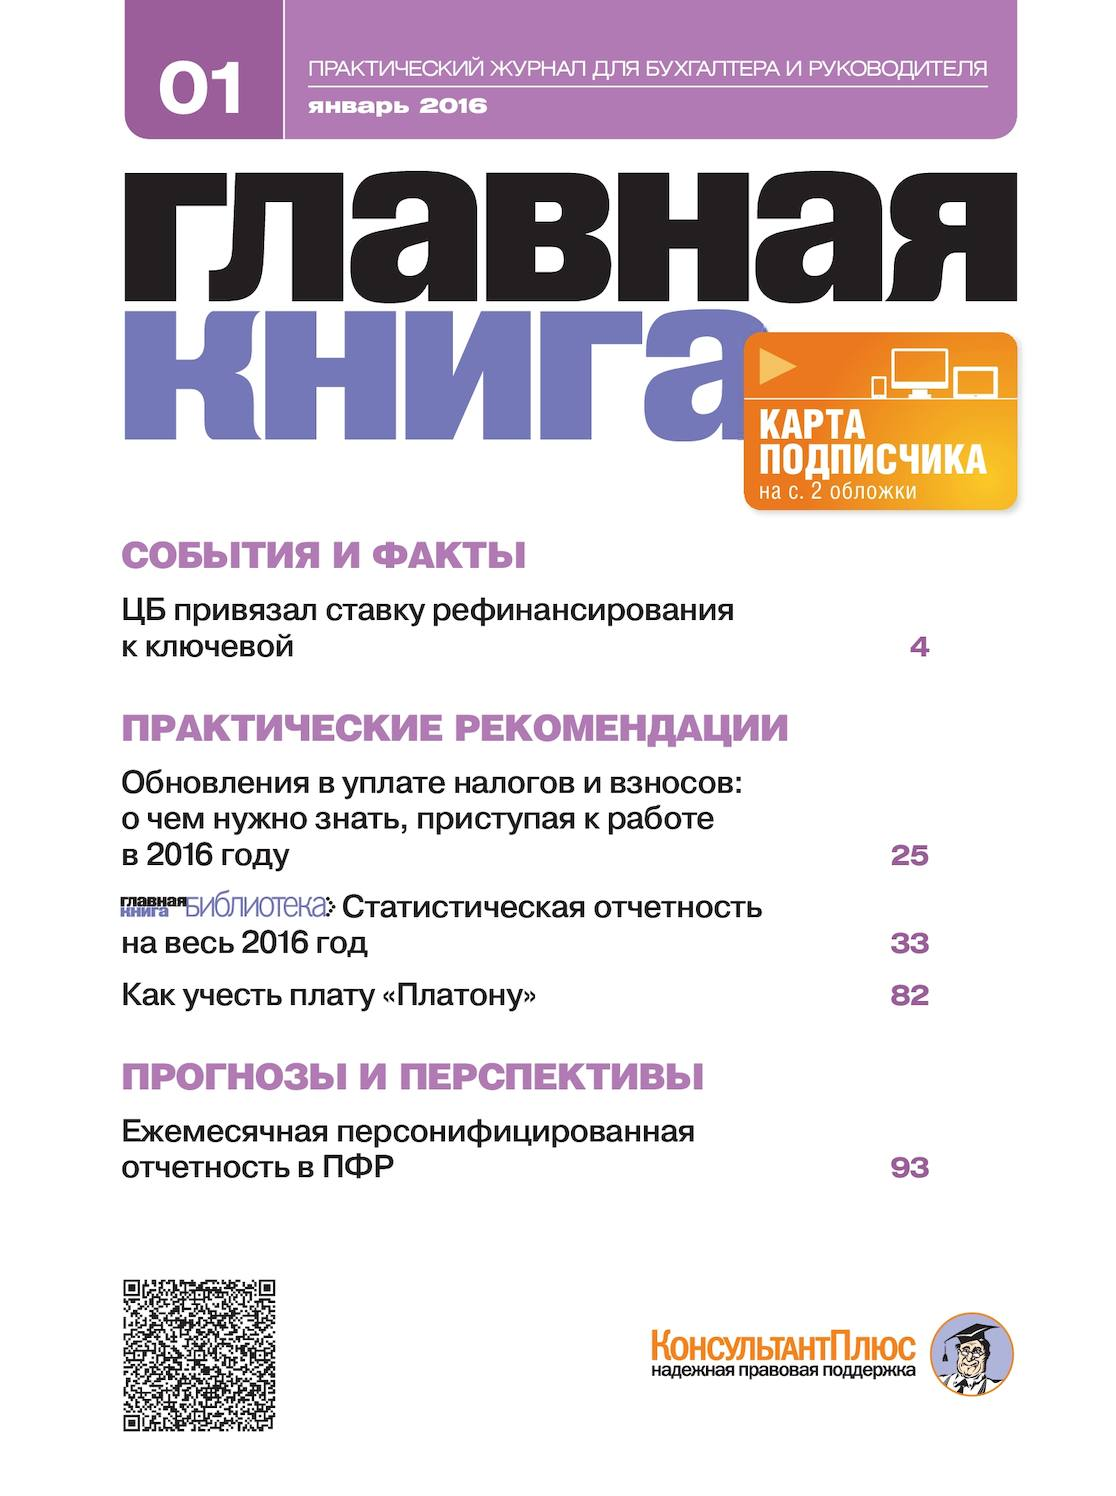 Займ 50000 рублей на карту онлайн круглосуточно